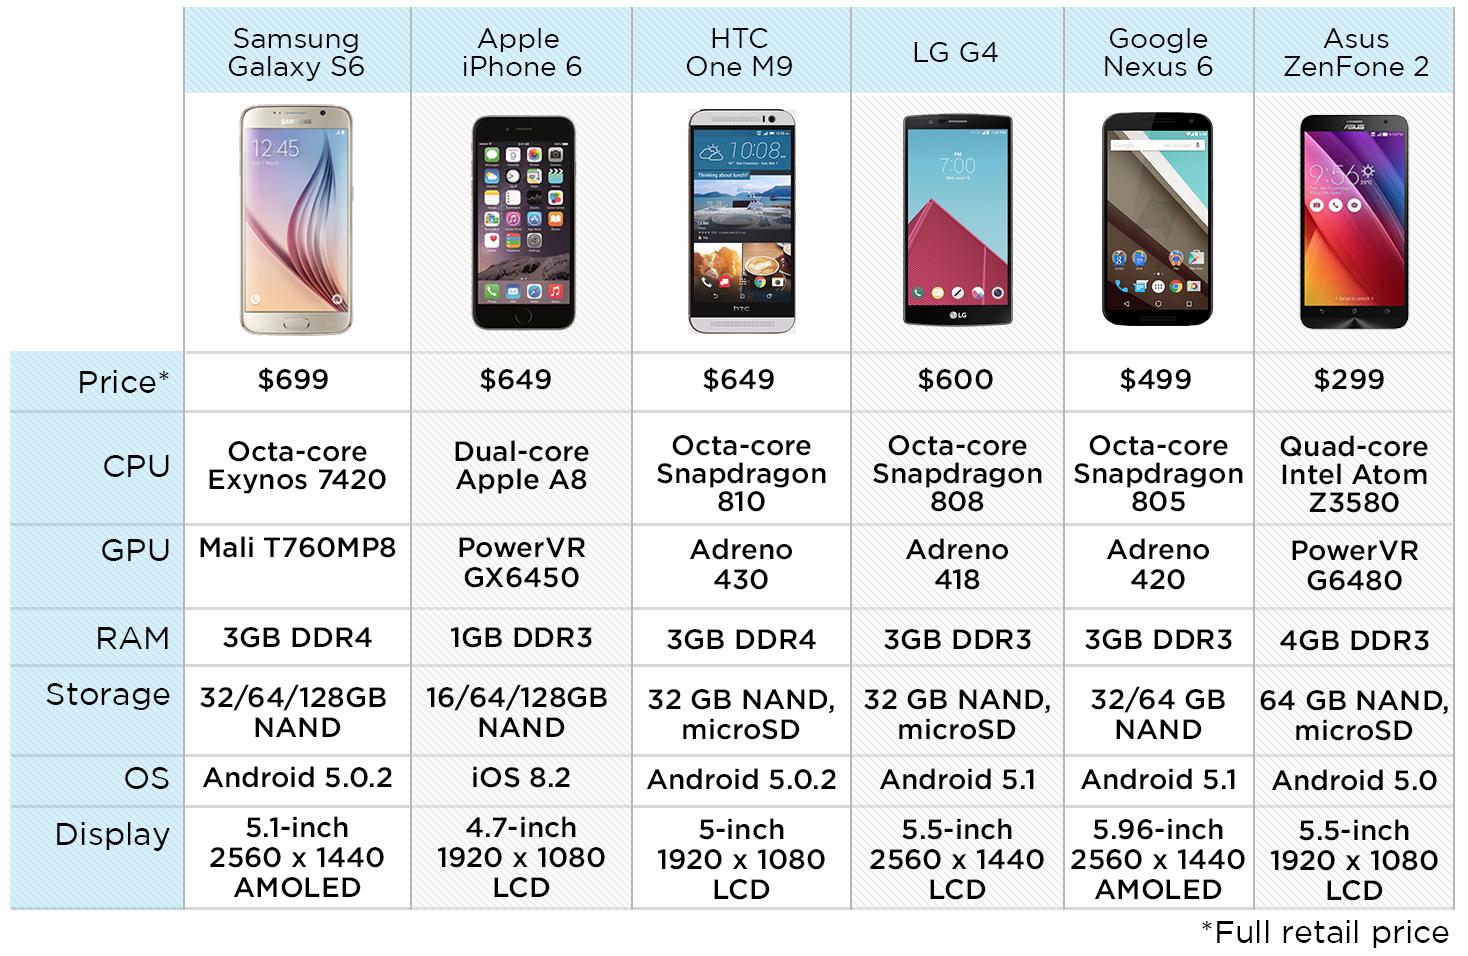 galaxy-s6-vs-zenfone-2-vs-g4-vs-iphone-6-vs-nexus-6-vs-one-m9-speed-tests-9